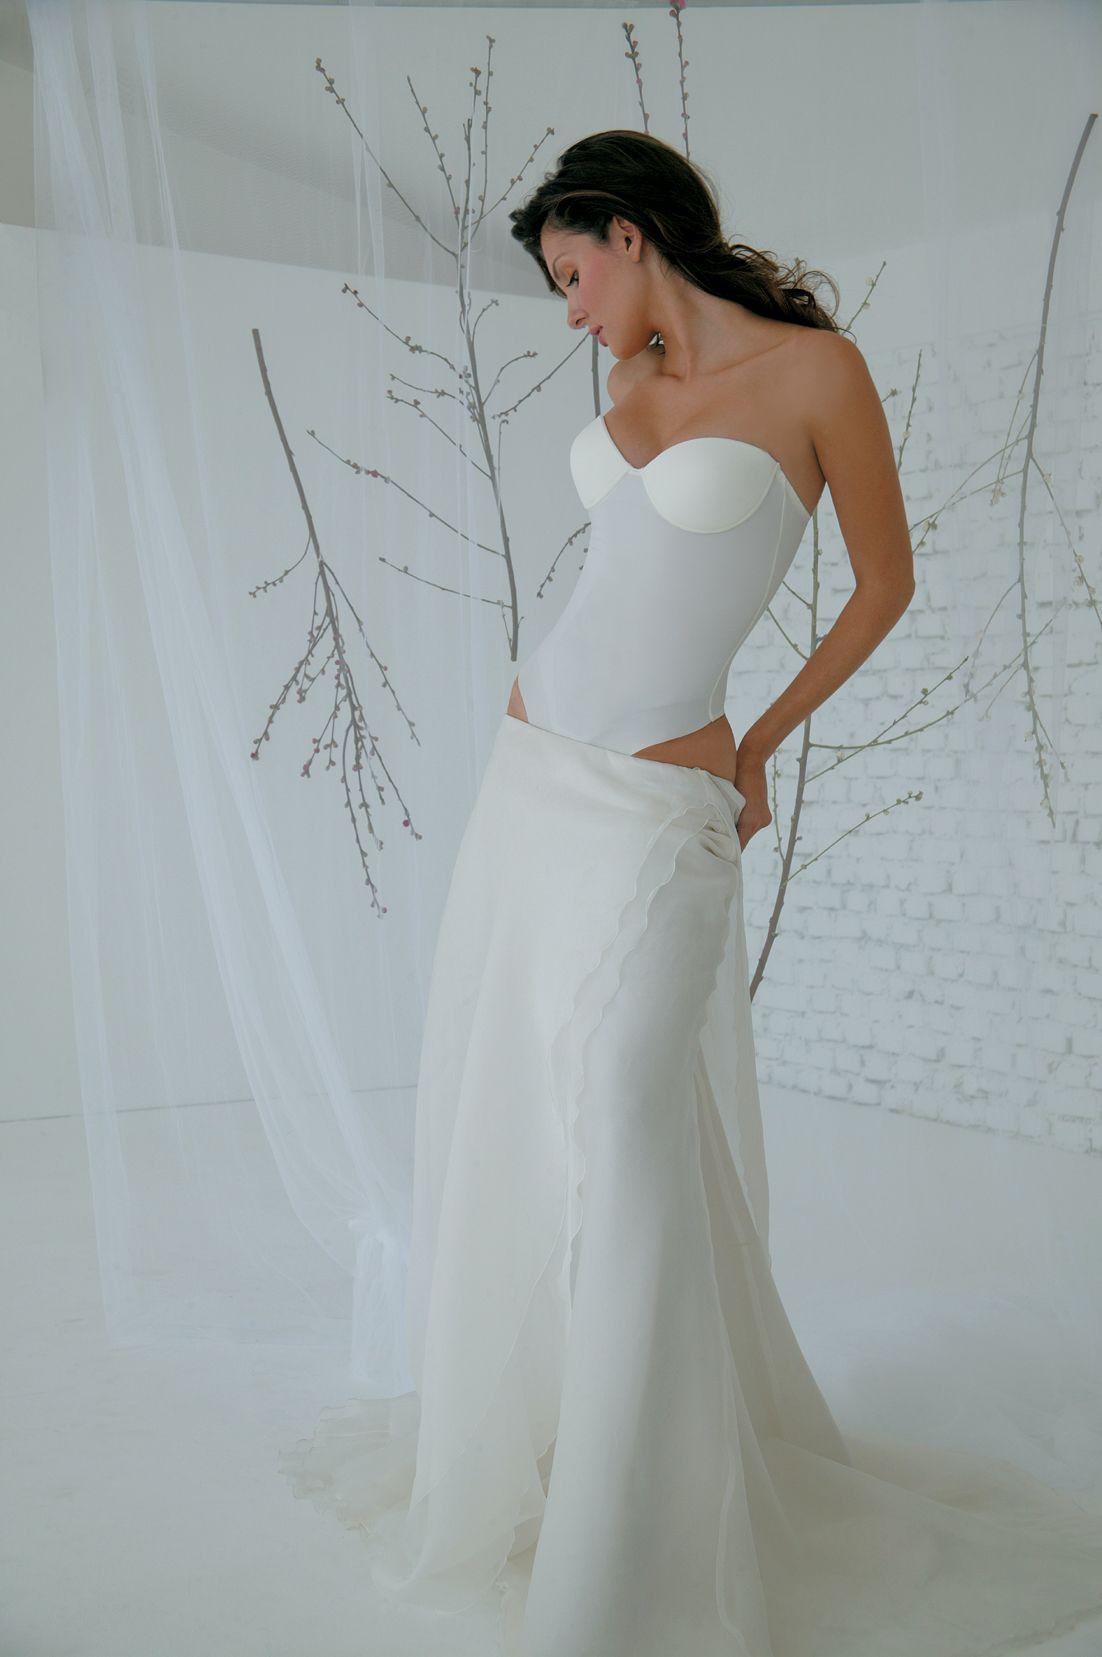 Contemporary Lingerie For Under Wedding Dress Elaboration - All ...